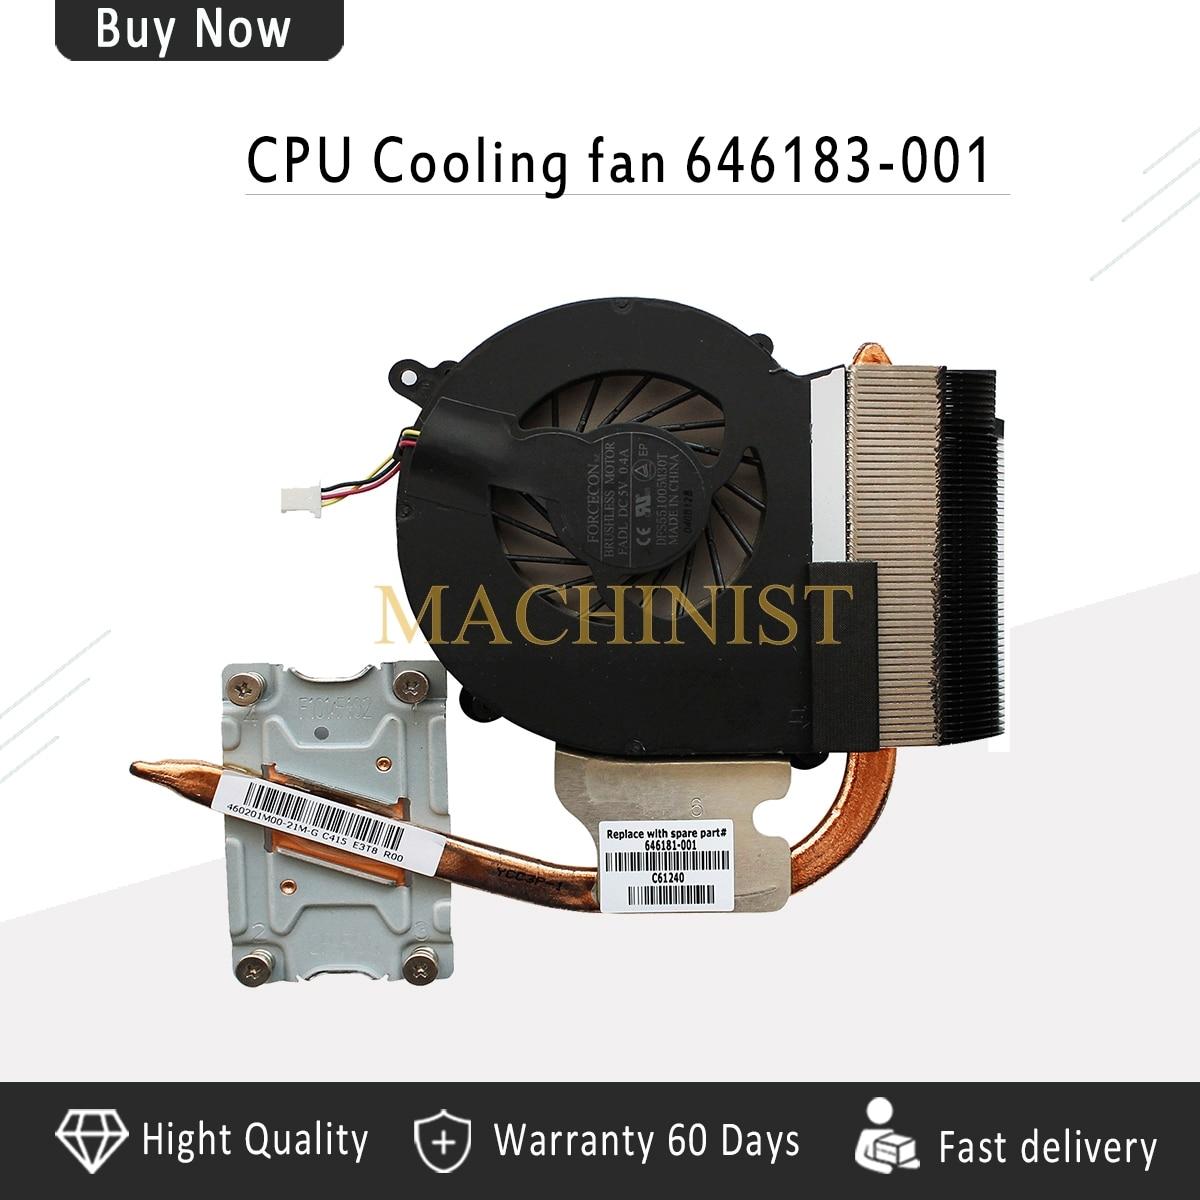 New Laptop radiator For HP 2000 CQ43 430 431 435 436 CQ57 630 631 Heatsink CPU Cooling fan cooler 646183-001 646181-001